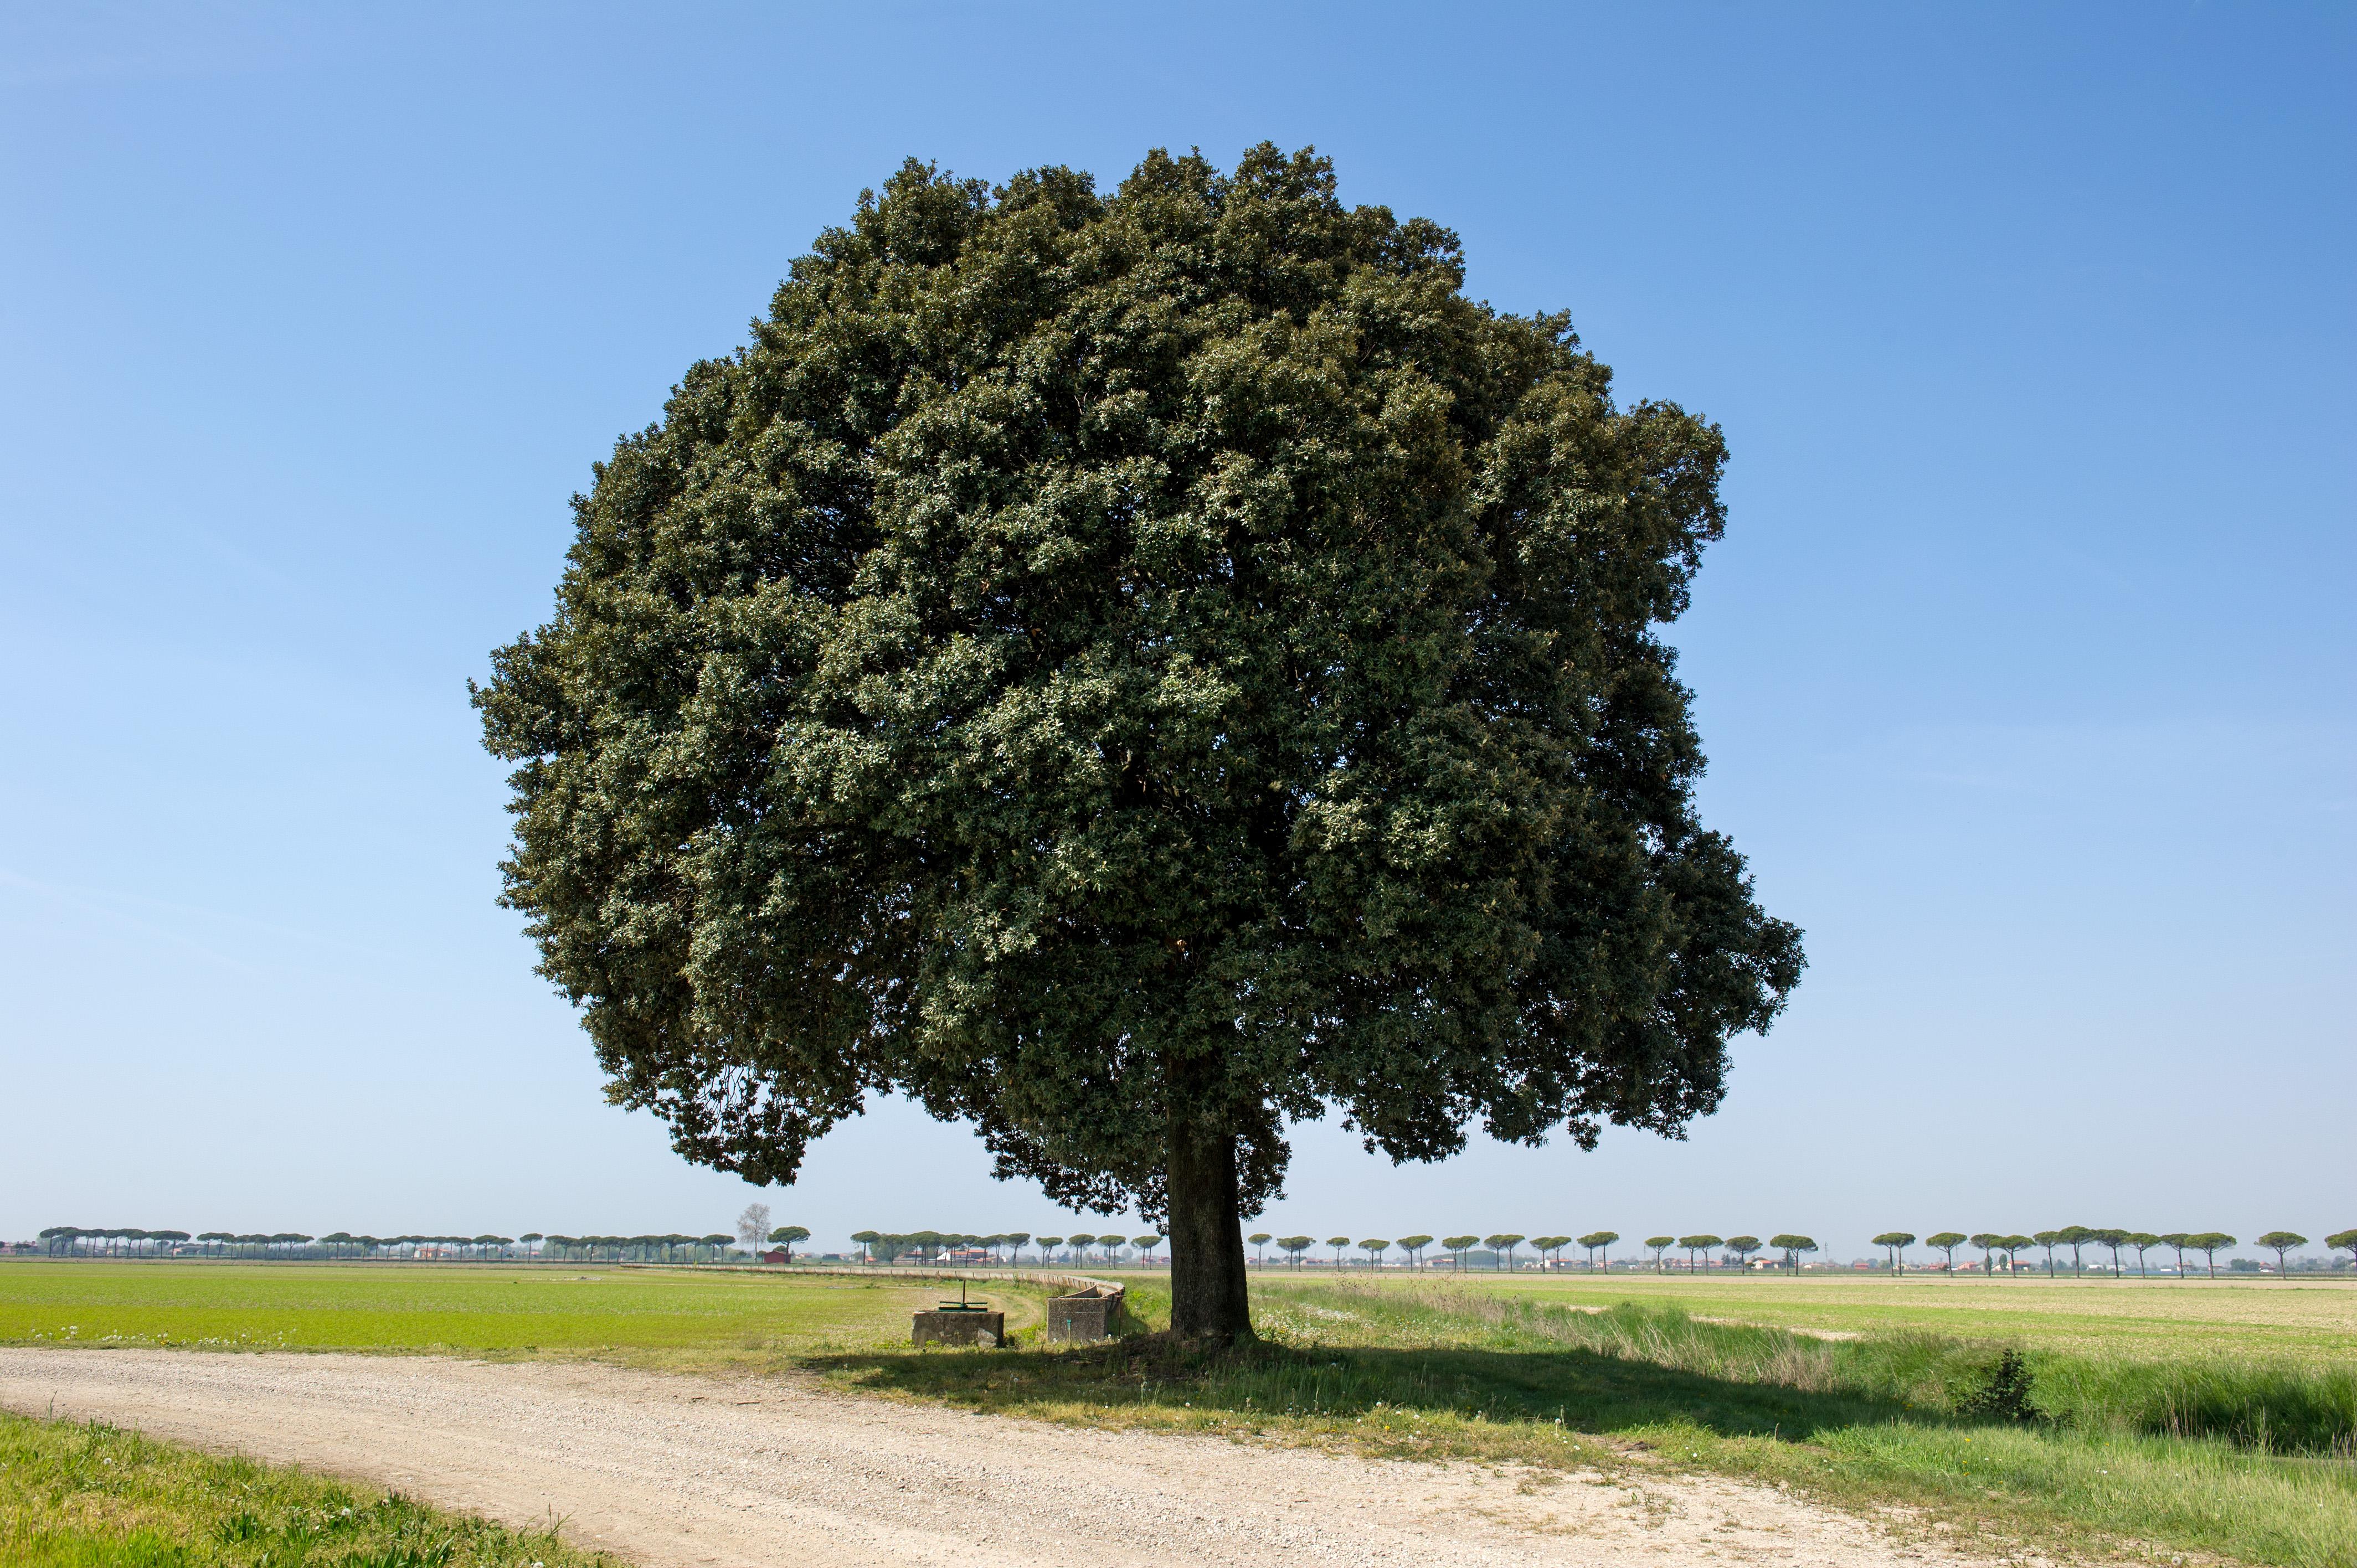 Piante Siepe Crescita Rapida siepi piante arboree | biodinamica san michele